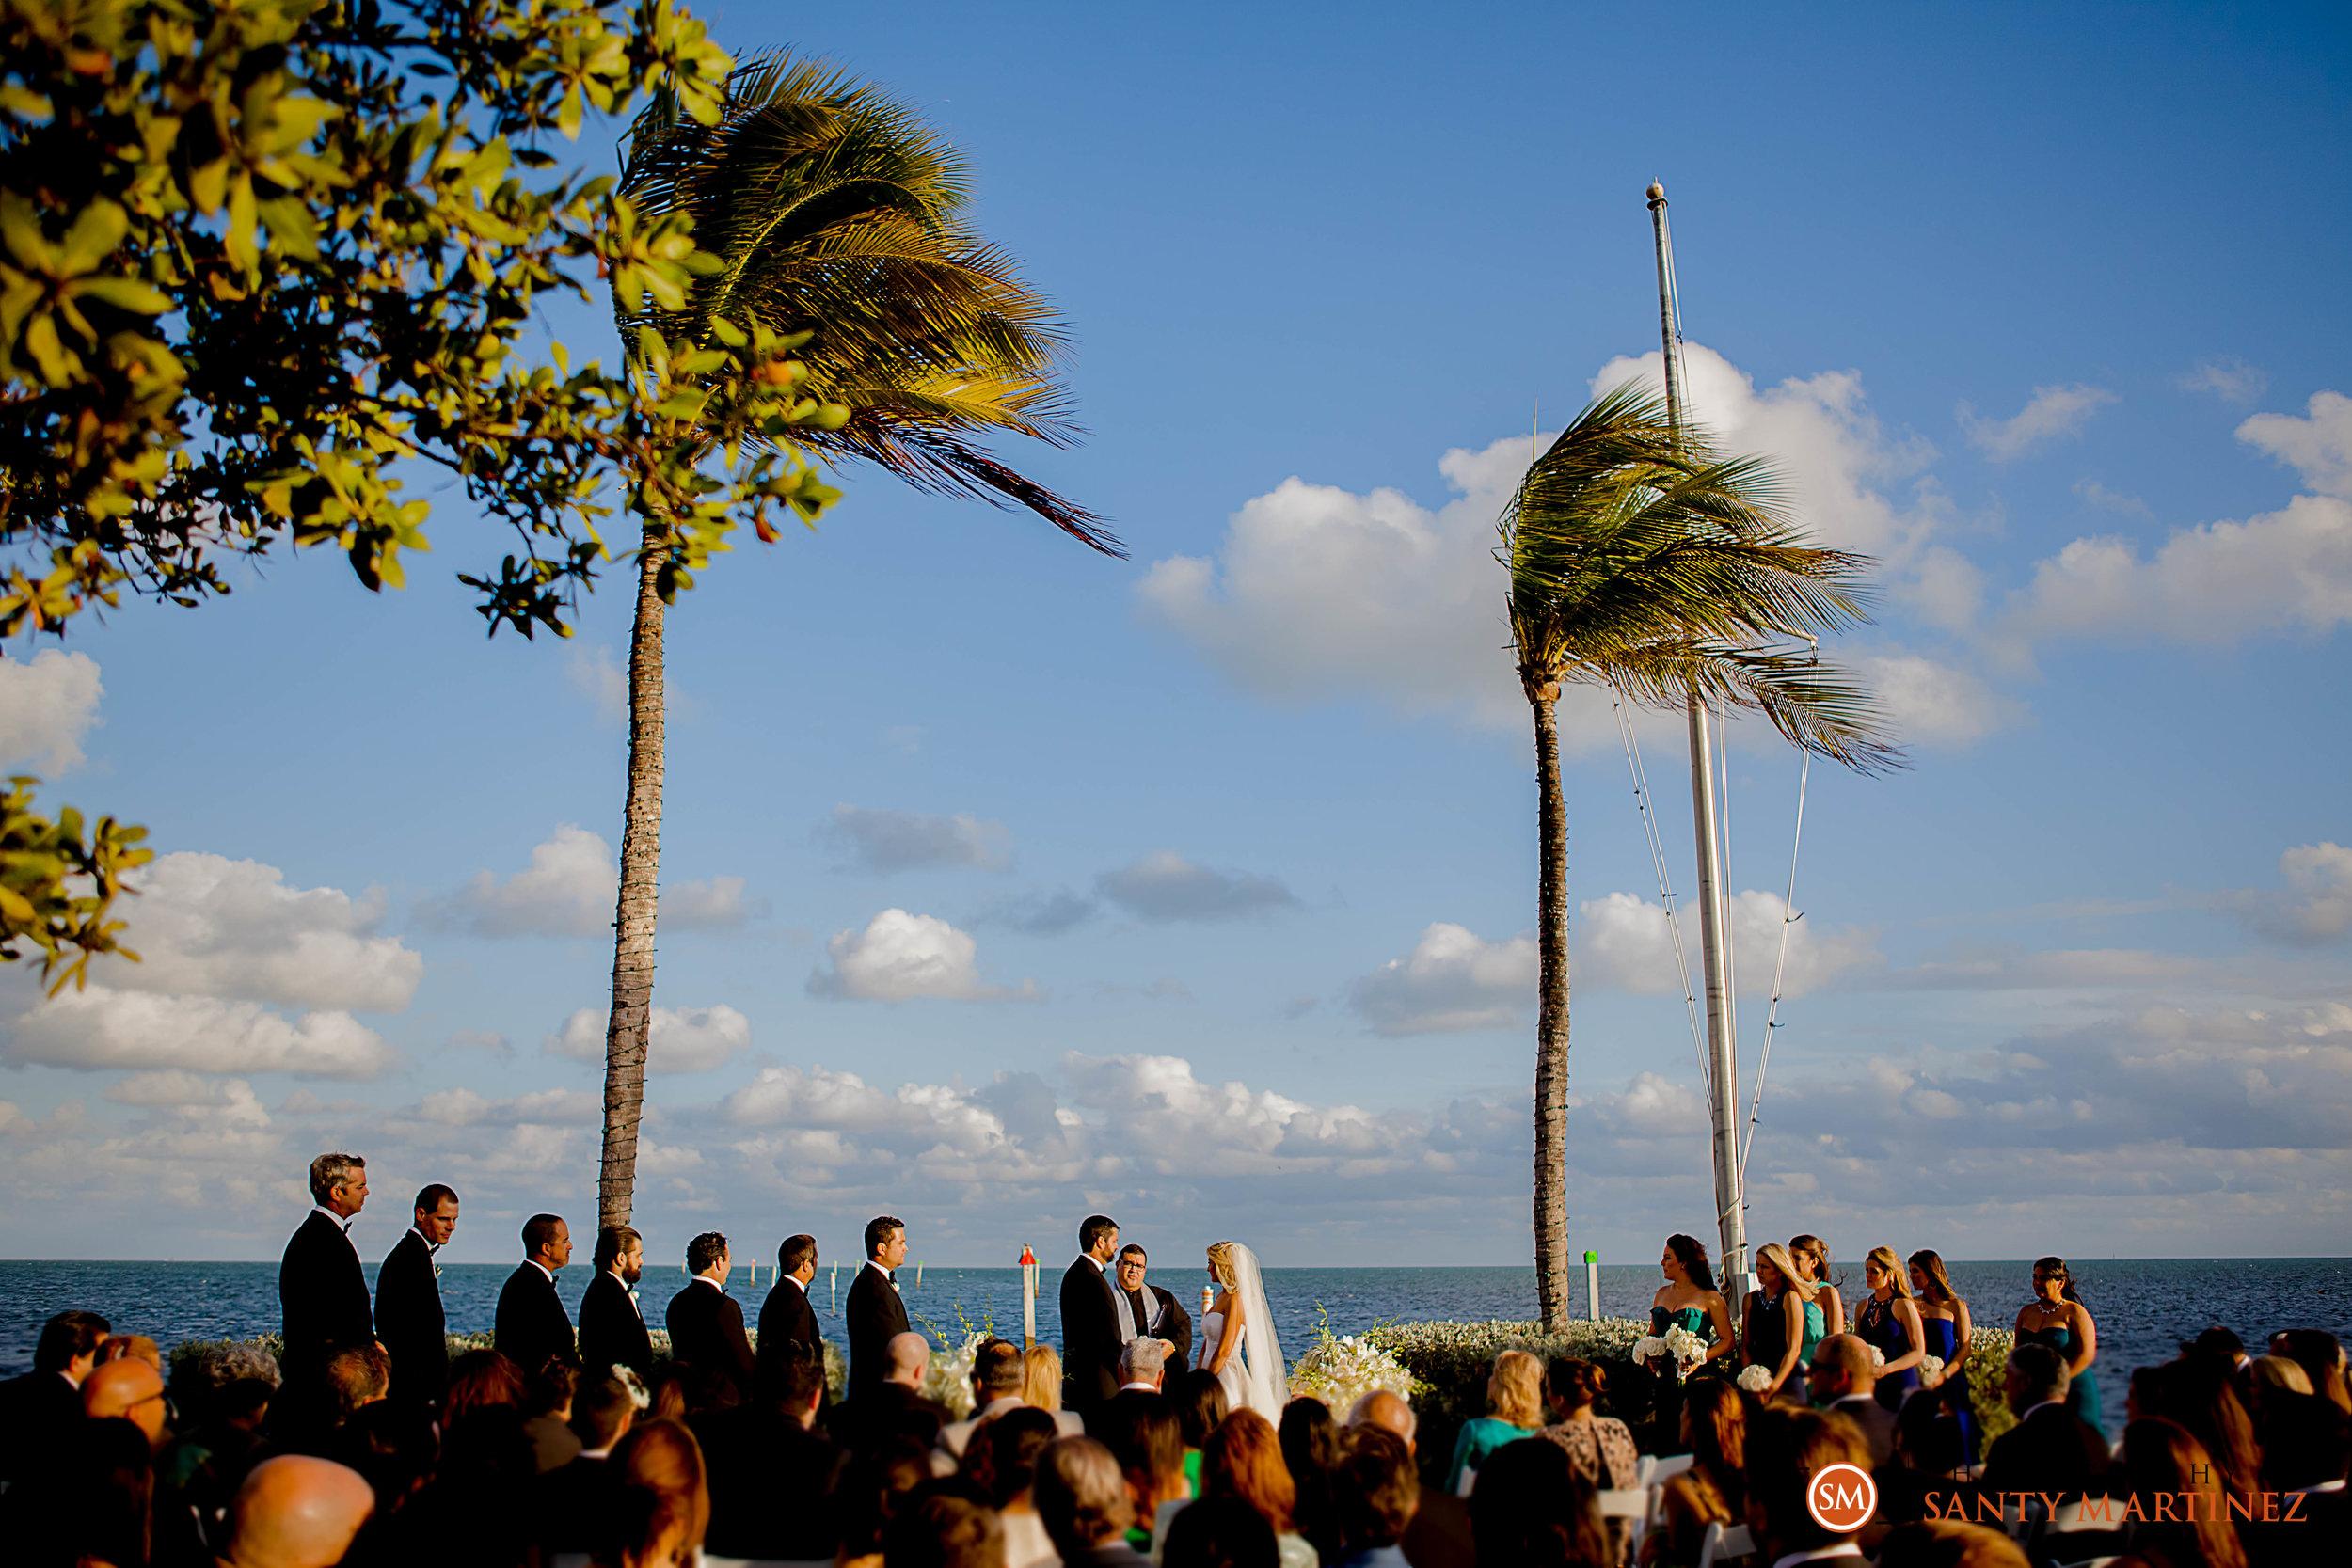 Miami Wedding Photographer - Santy Martinez -13-2.jpg